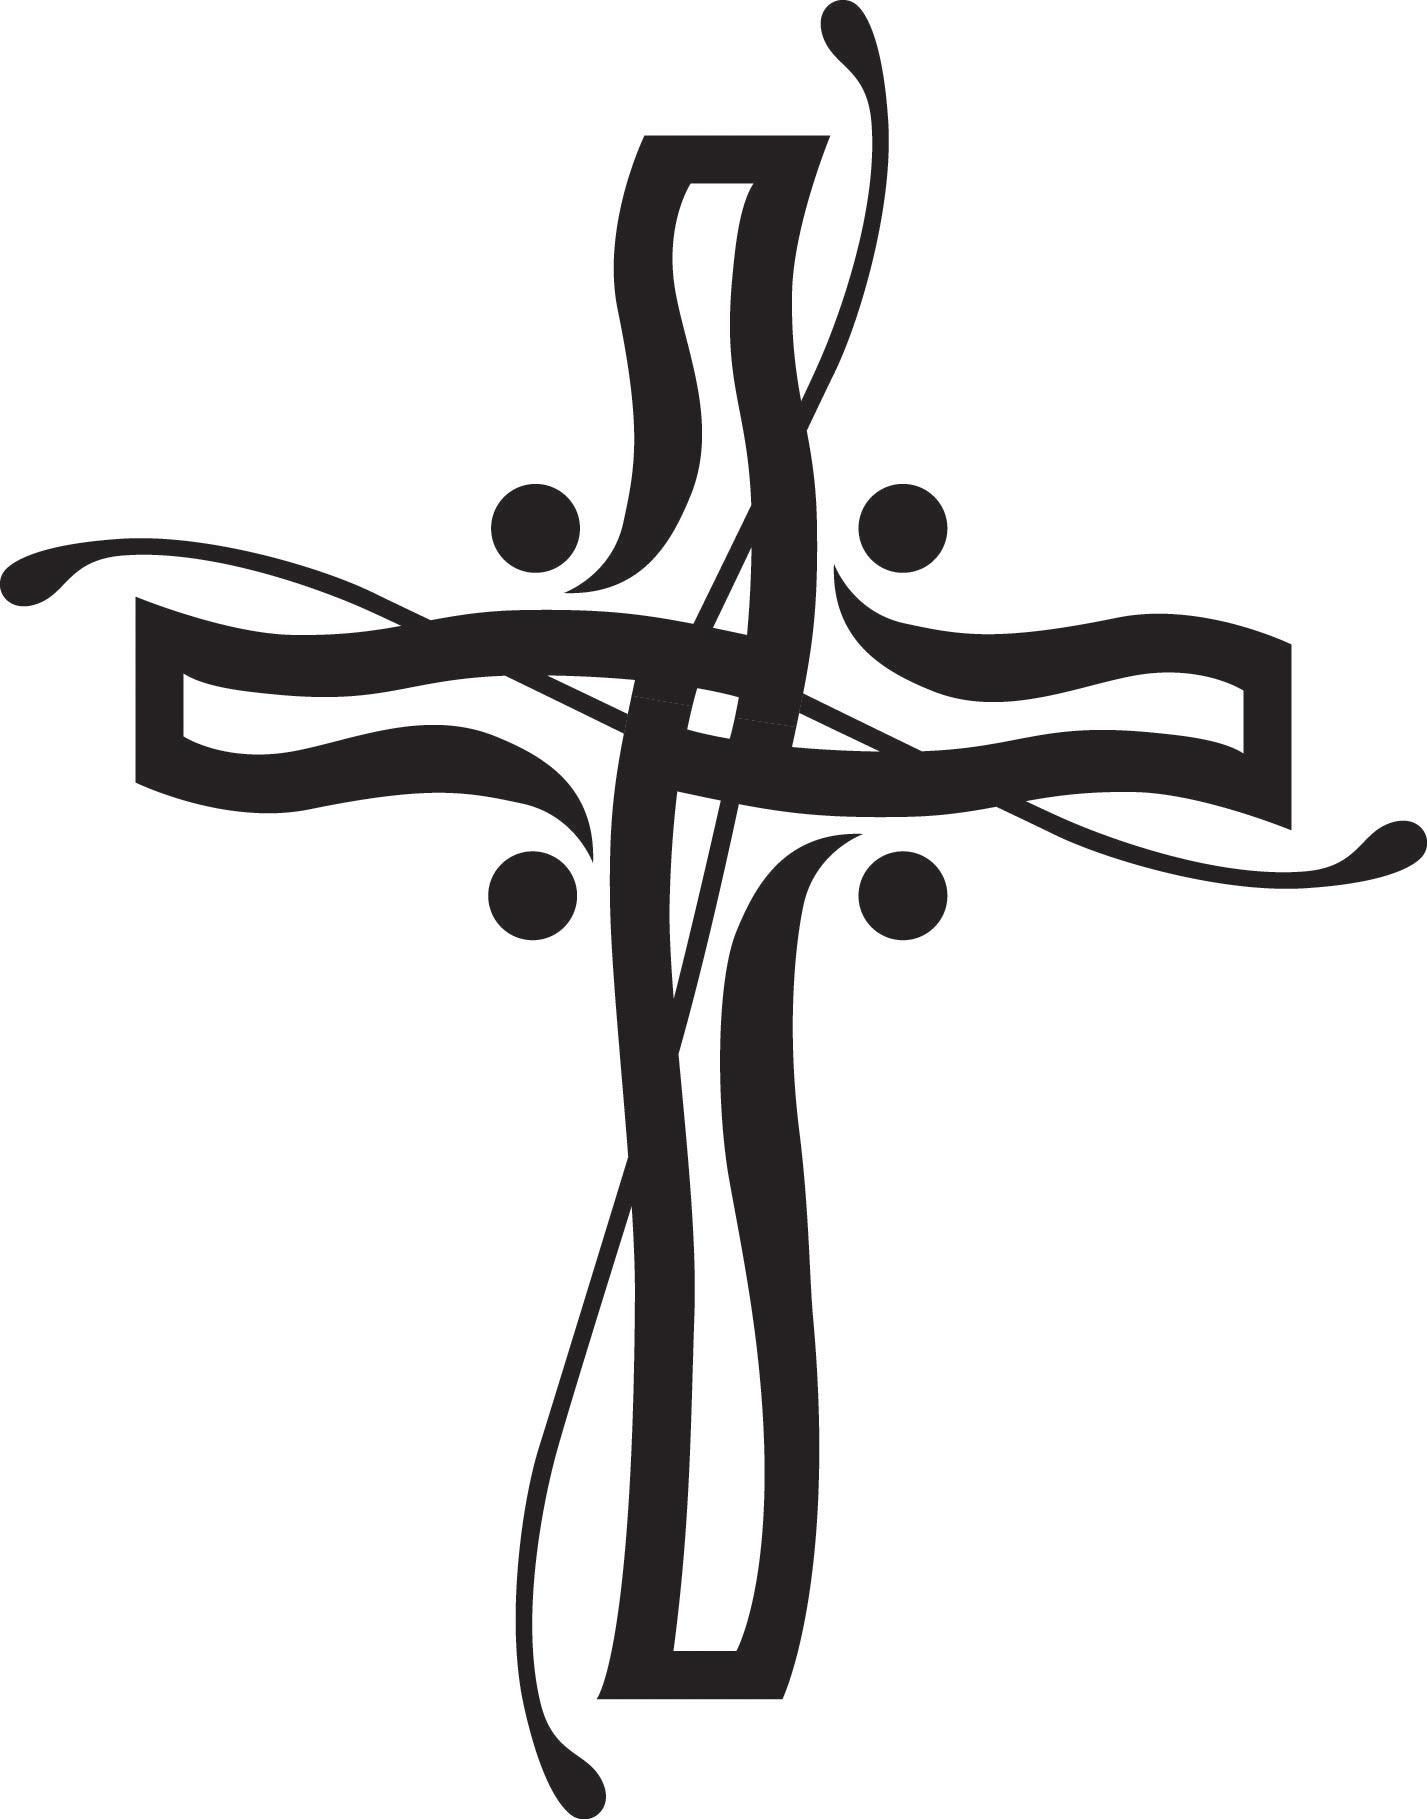 1427x1819 Religious Clipart Christian Free Religious Clip Art 2 2